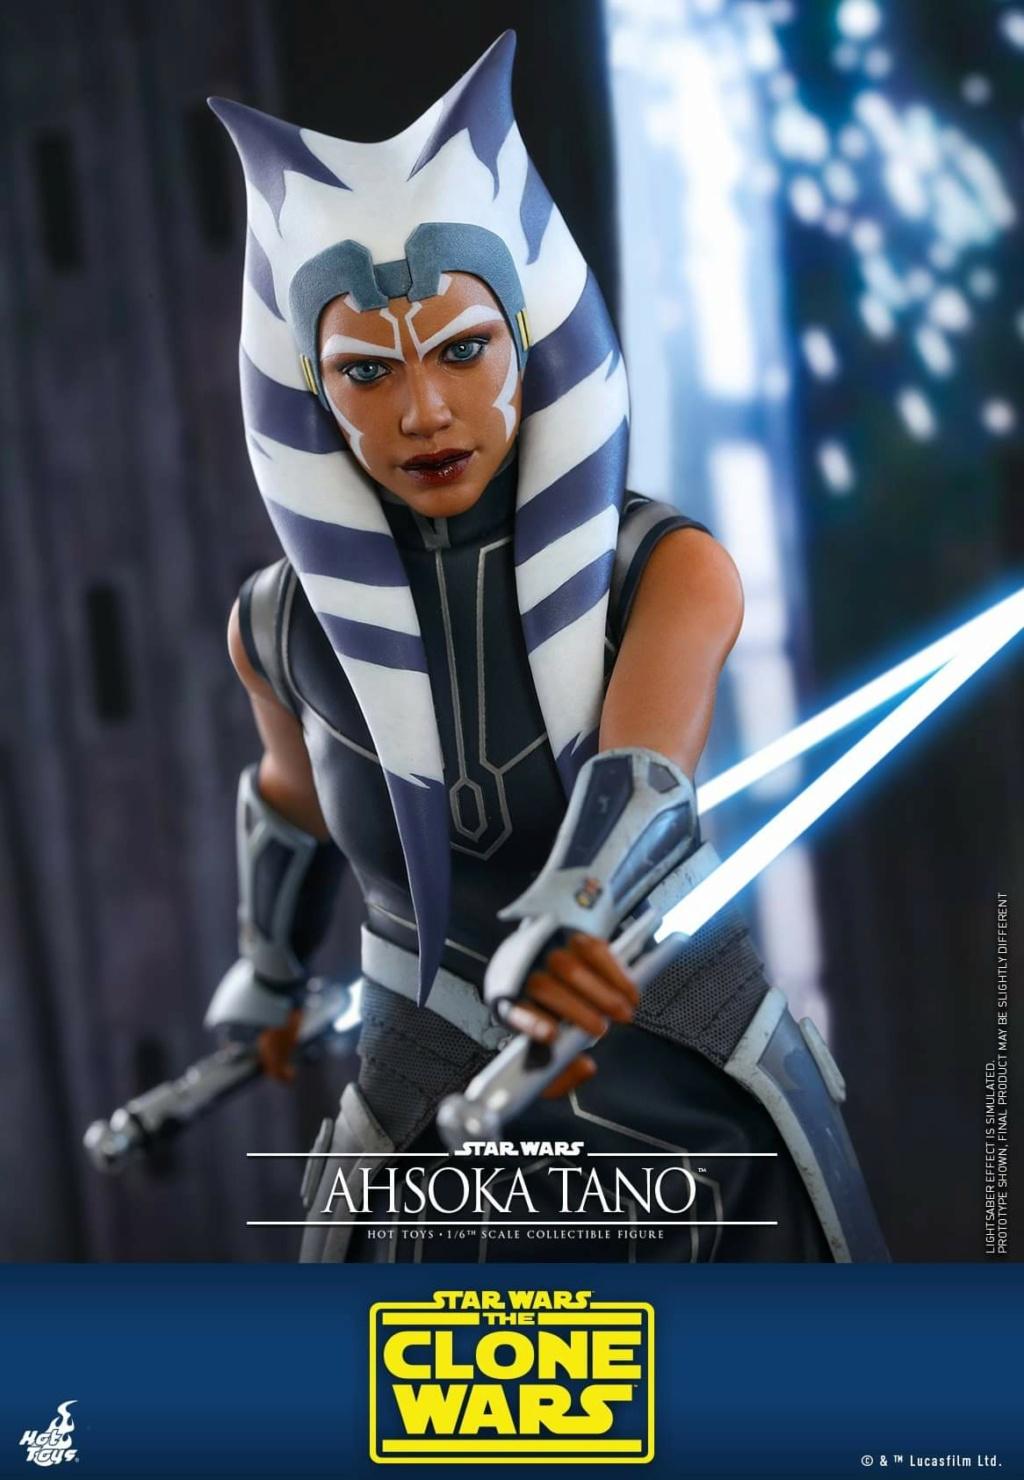 Ahsoka Tano - 1/6th scale - The Clone Wars - Hot Toys Fb_im128